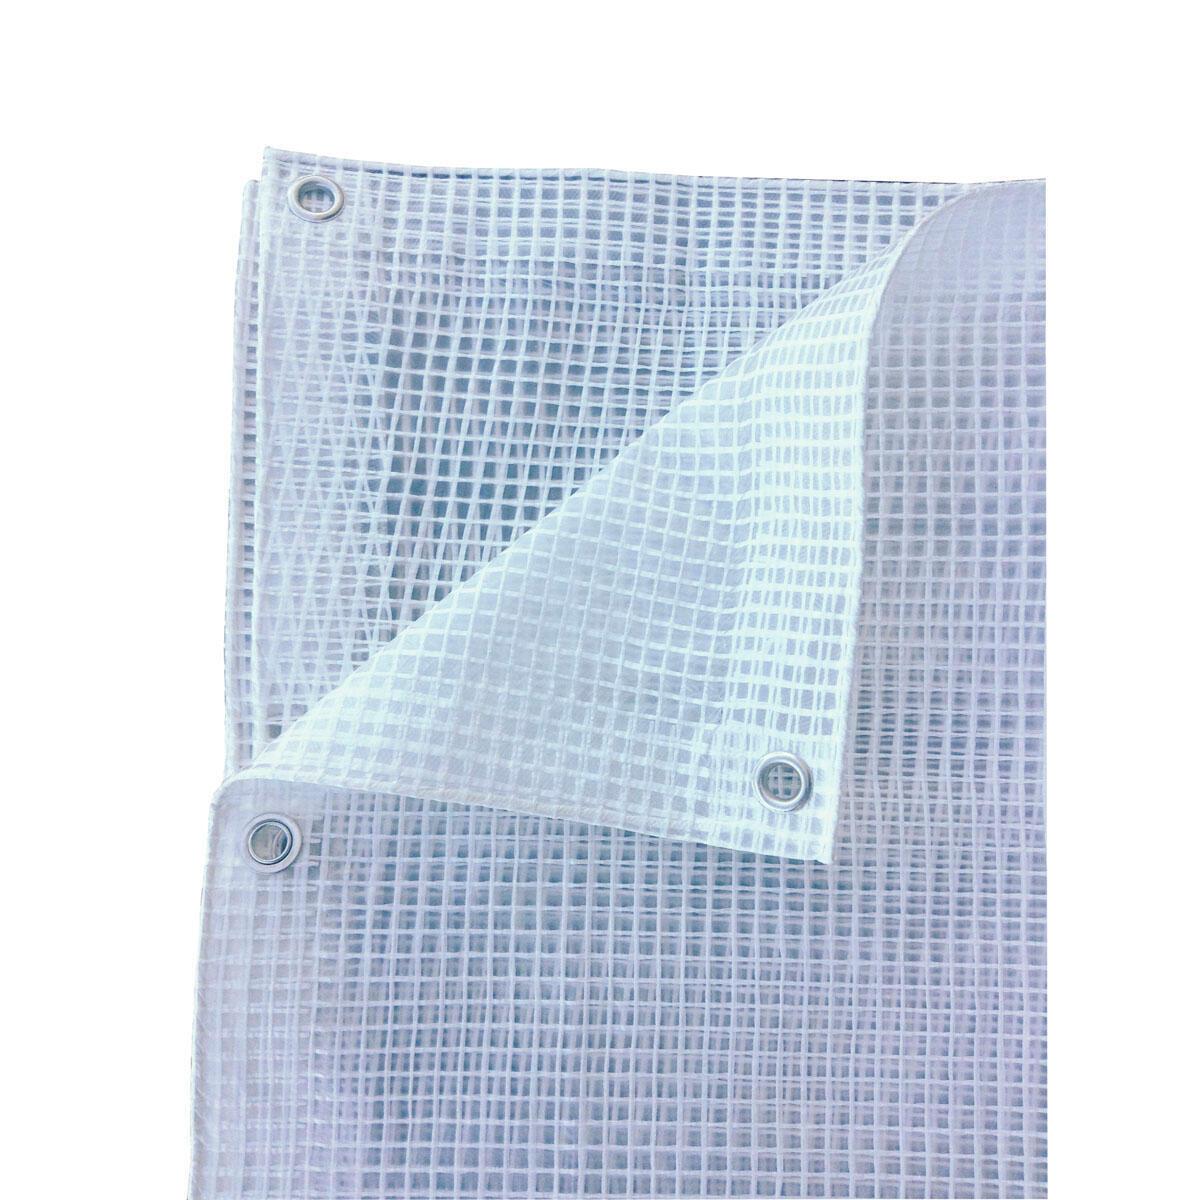 Telo per tenda da esterno trasparente 300 x 350 cm